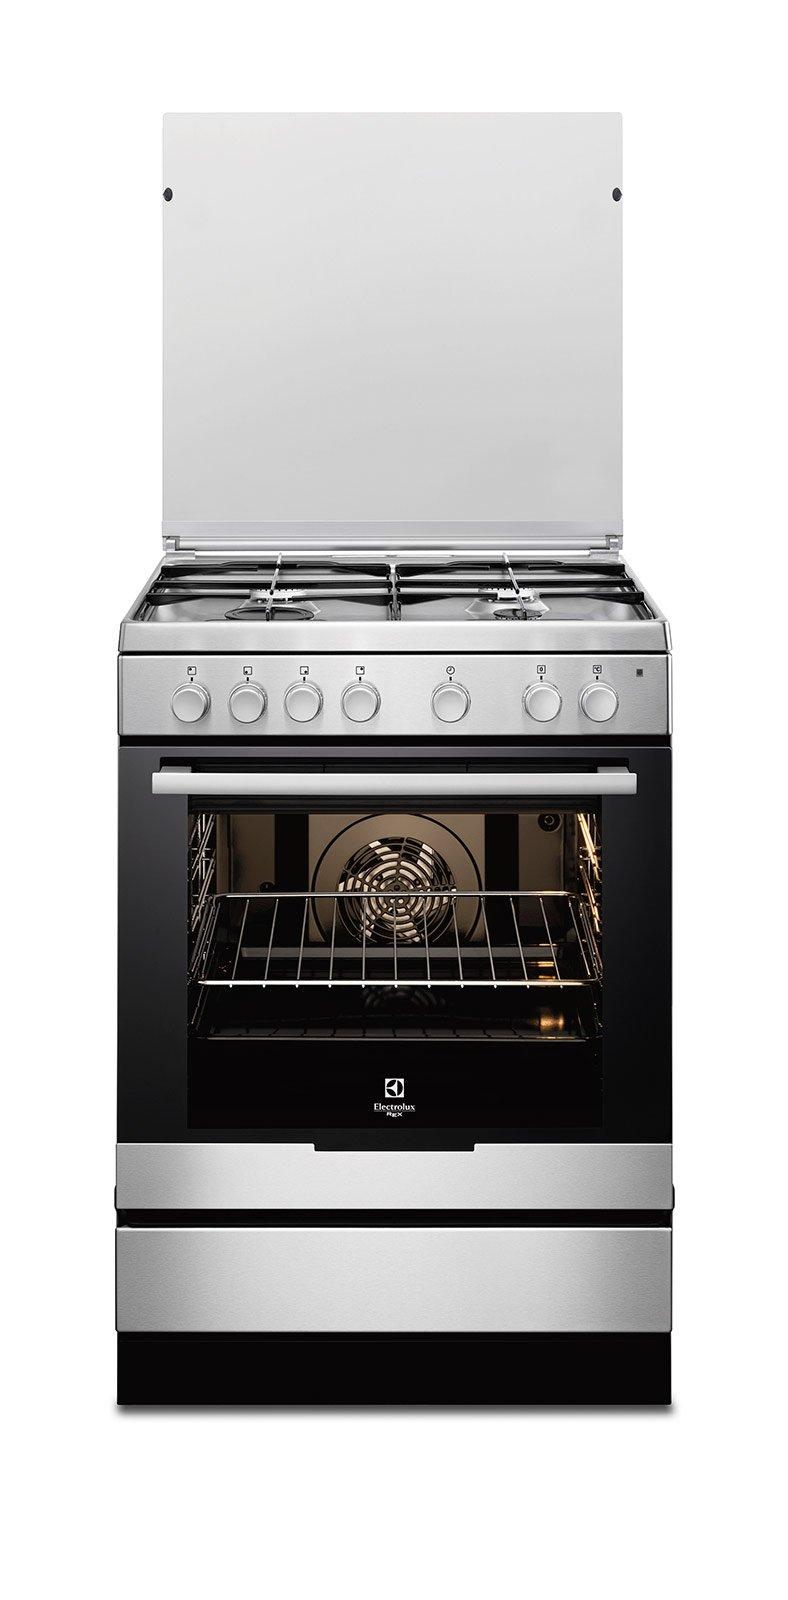 Great ... La Cucina InfiSpace RKK 6130 AOX Di Electrolux Rex Con Piano Cottura A  Gas, Ha ...